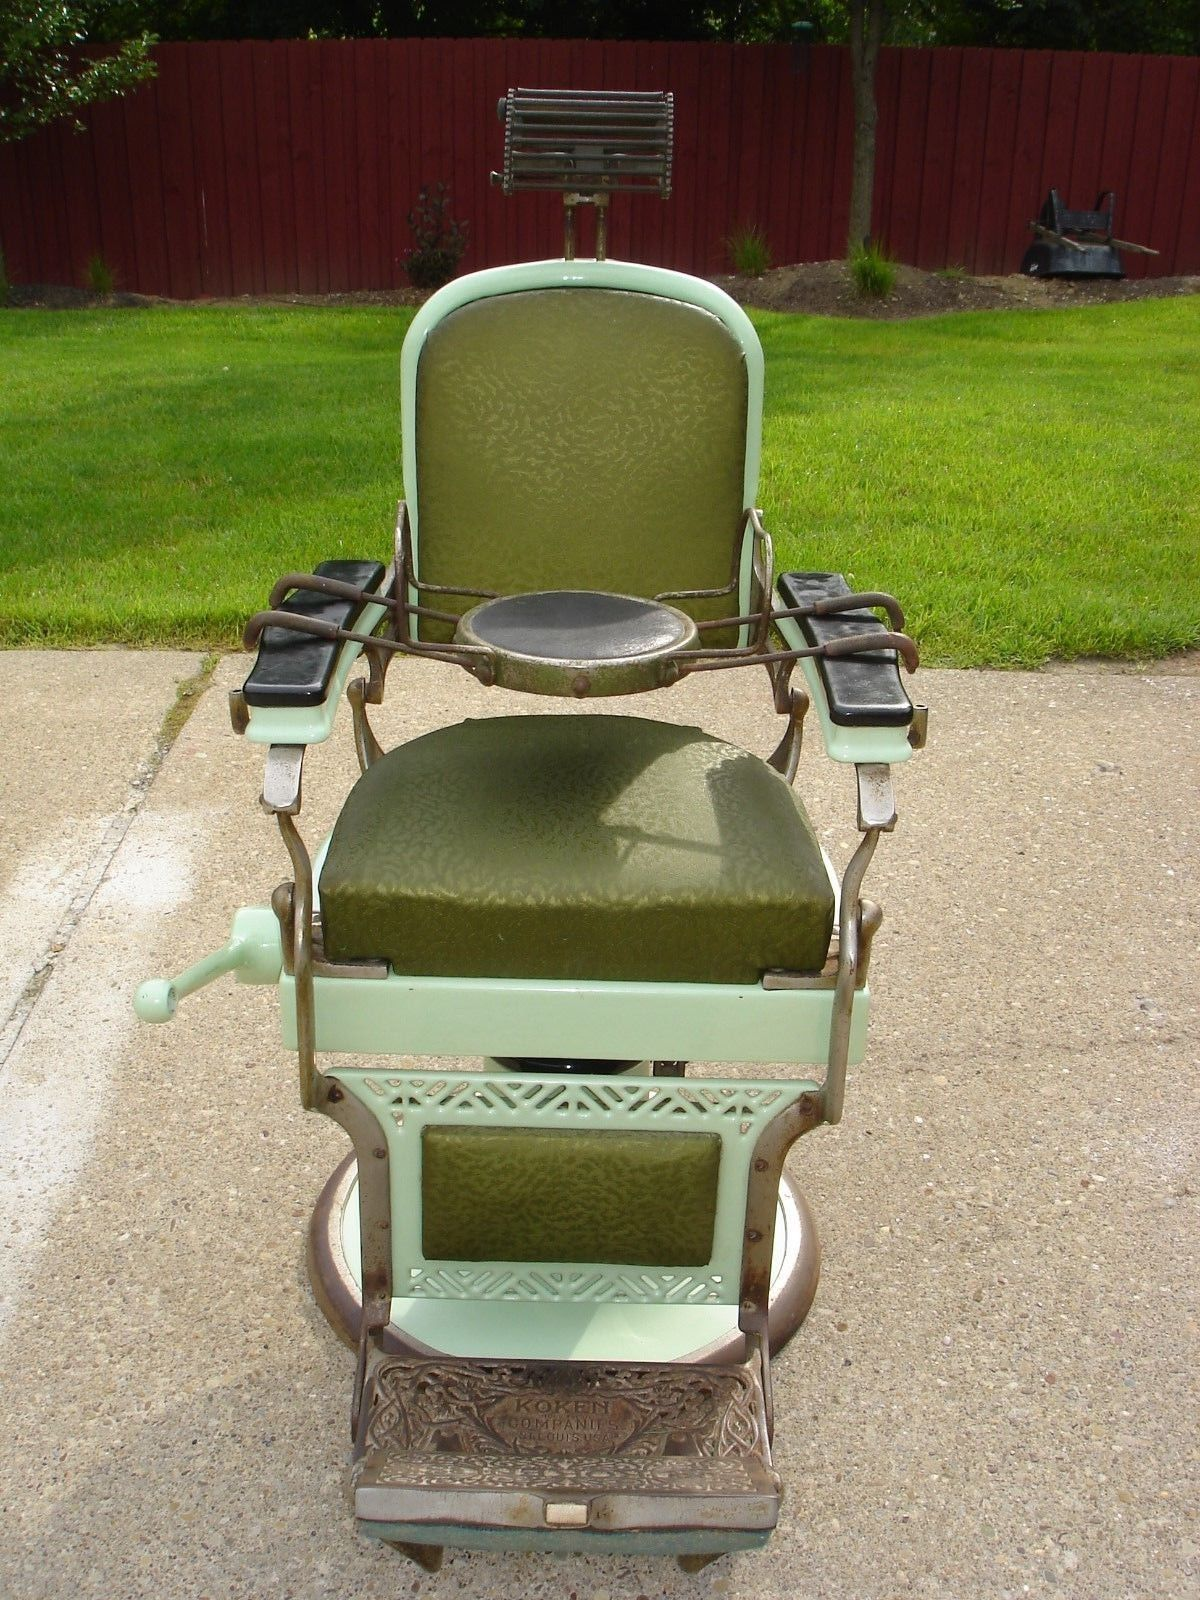 barber ideas design the unique mebrureoral chair koken